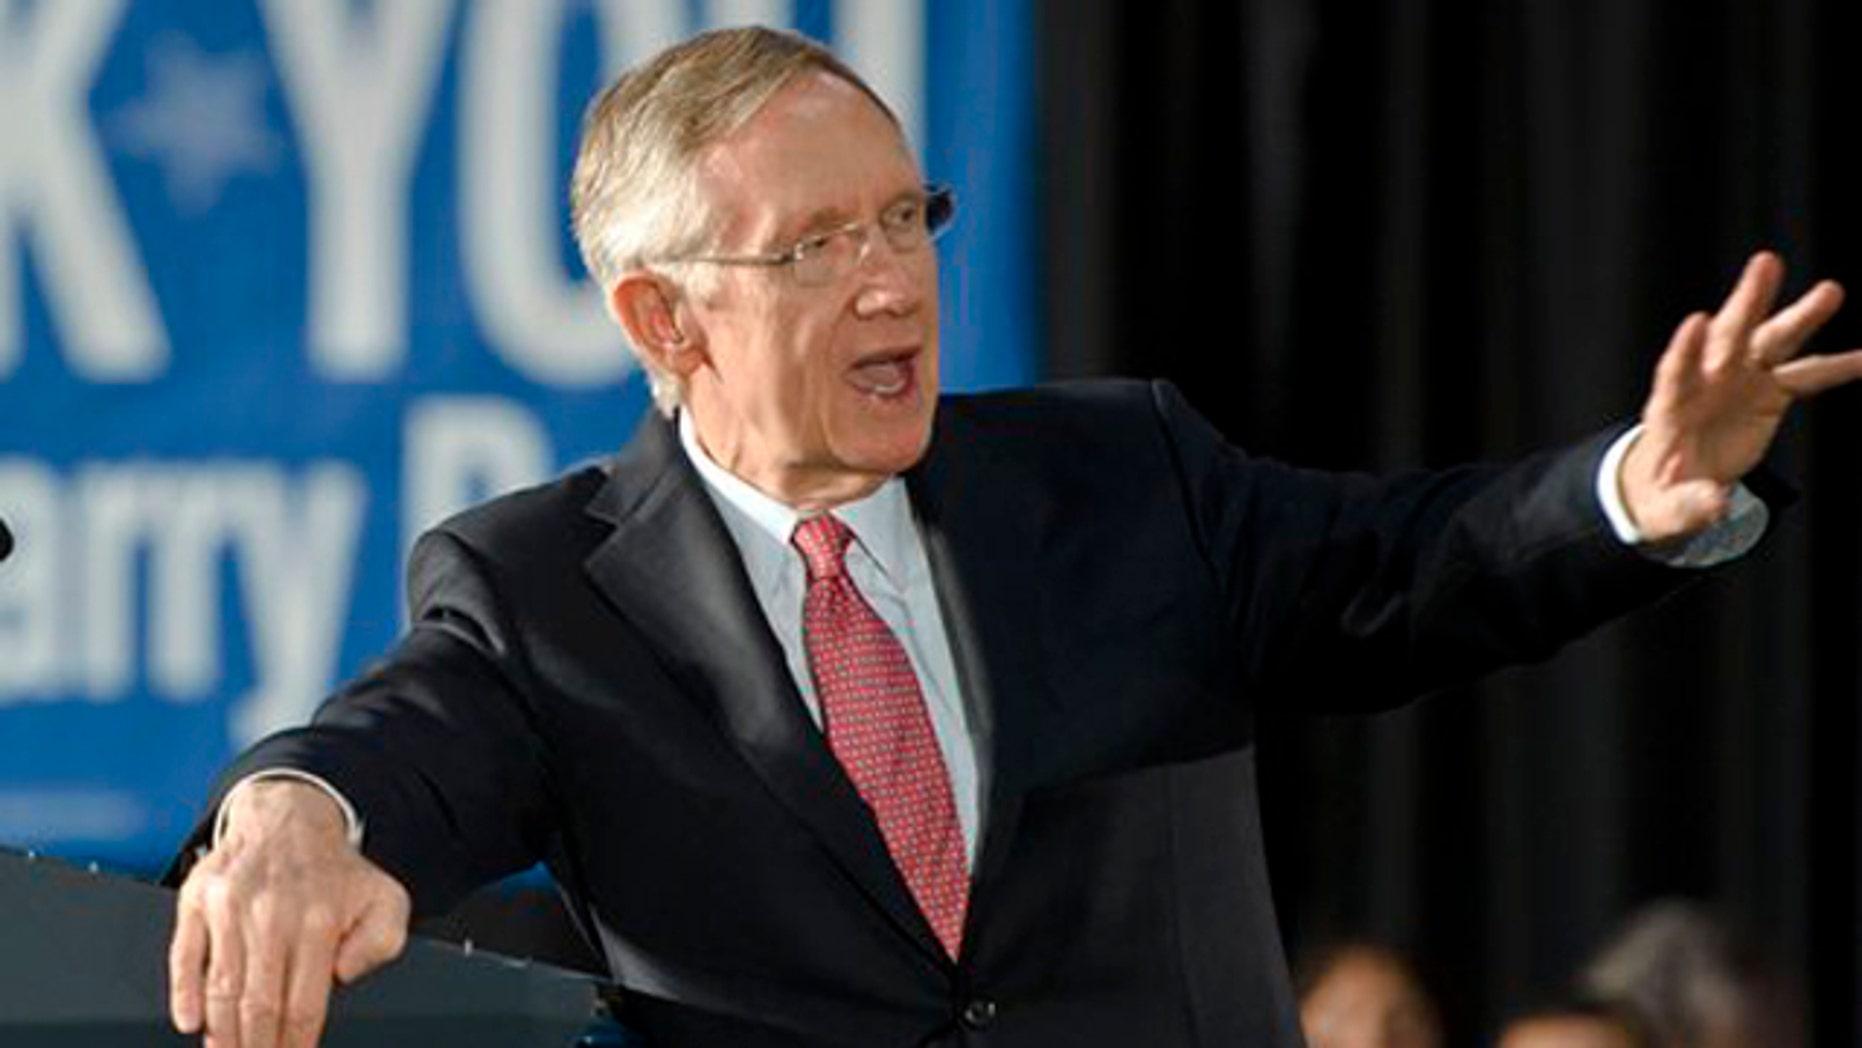 Sen. Harry Reid speaks at a rally at the University of Nevada, Reno campus Oct. 20.(AP Photo)